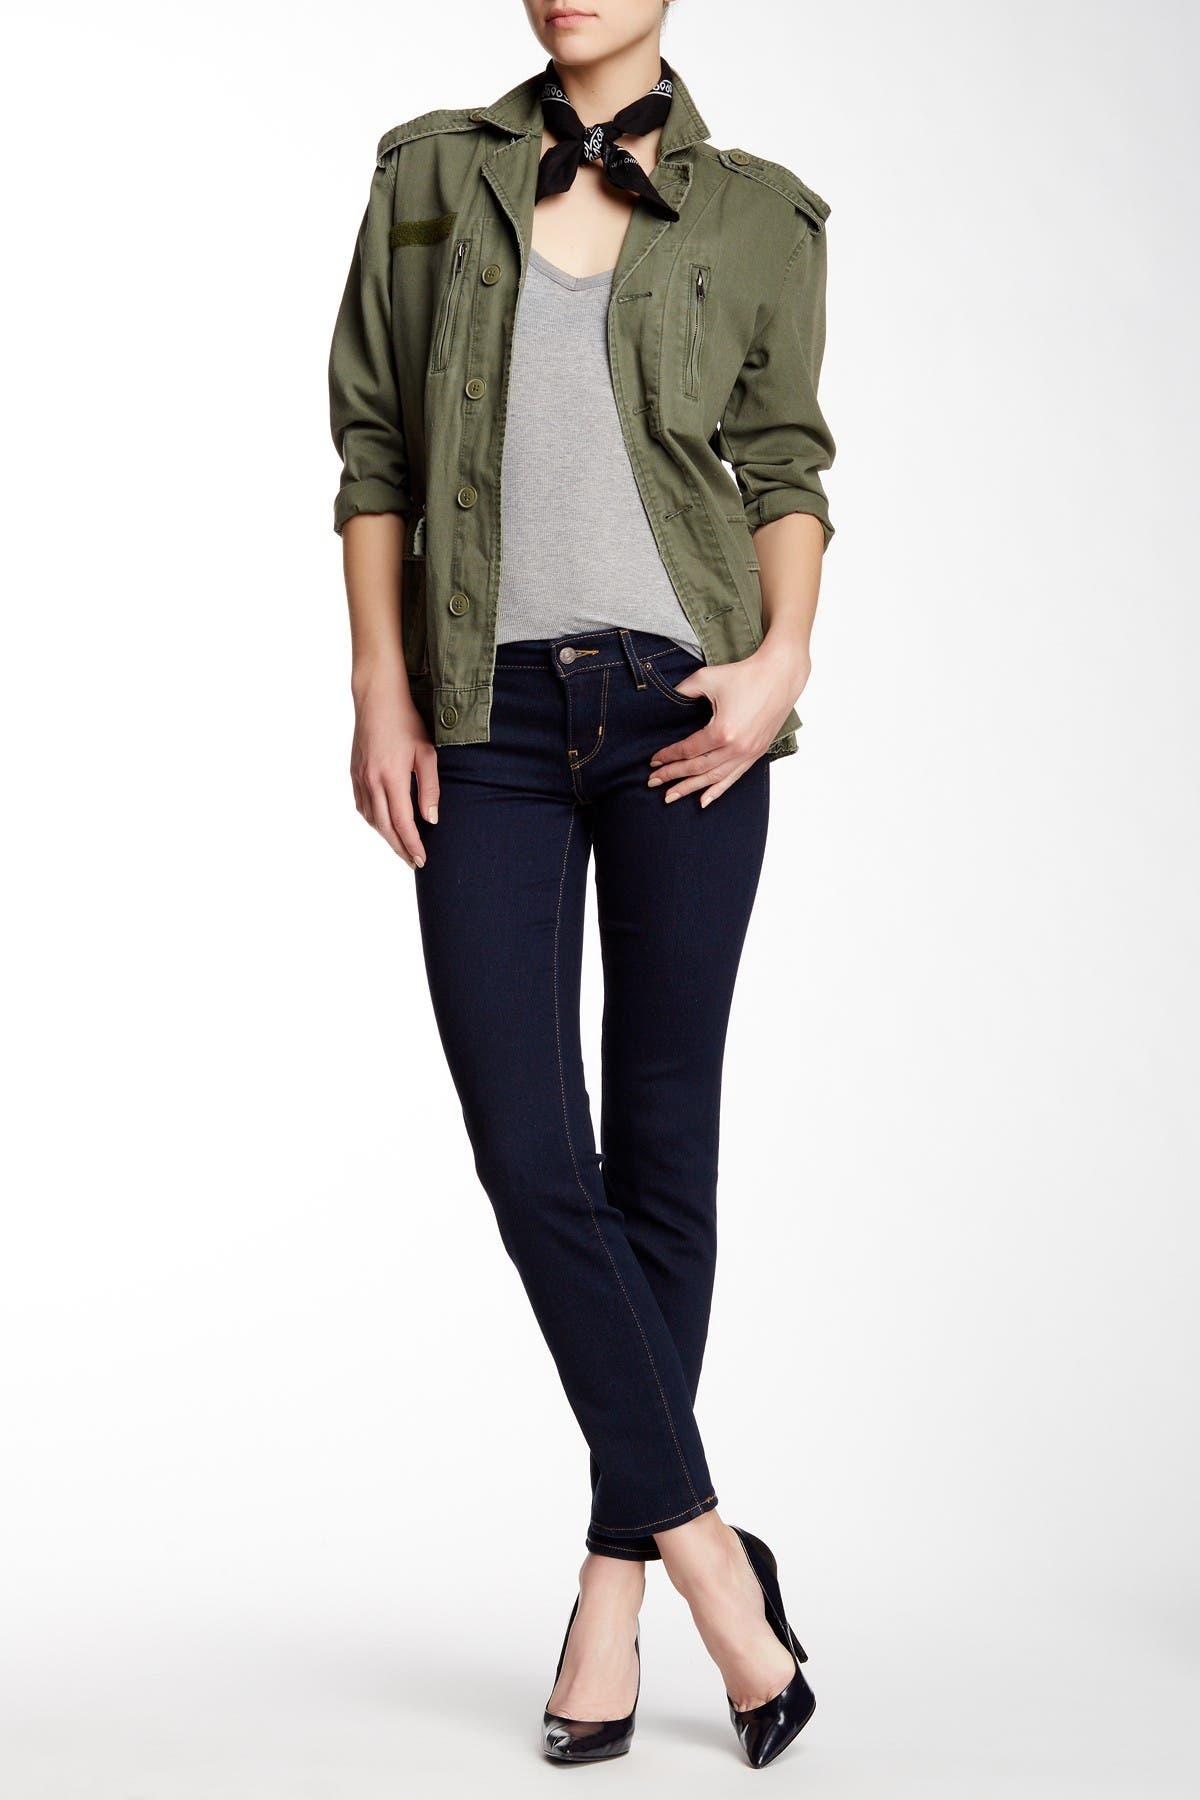 Image of Levi's 712 Slim Jean